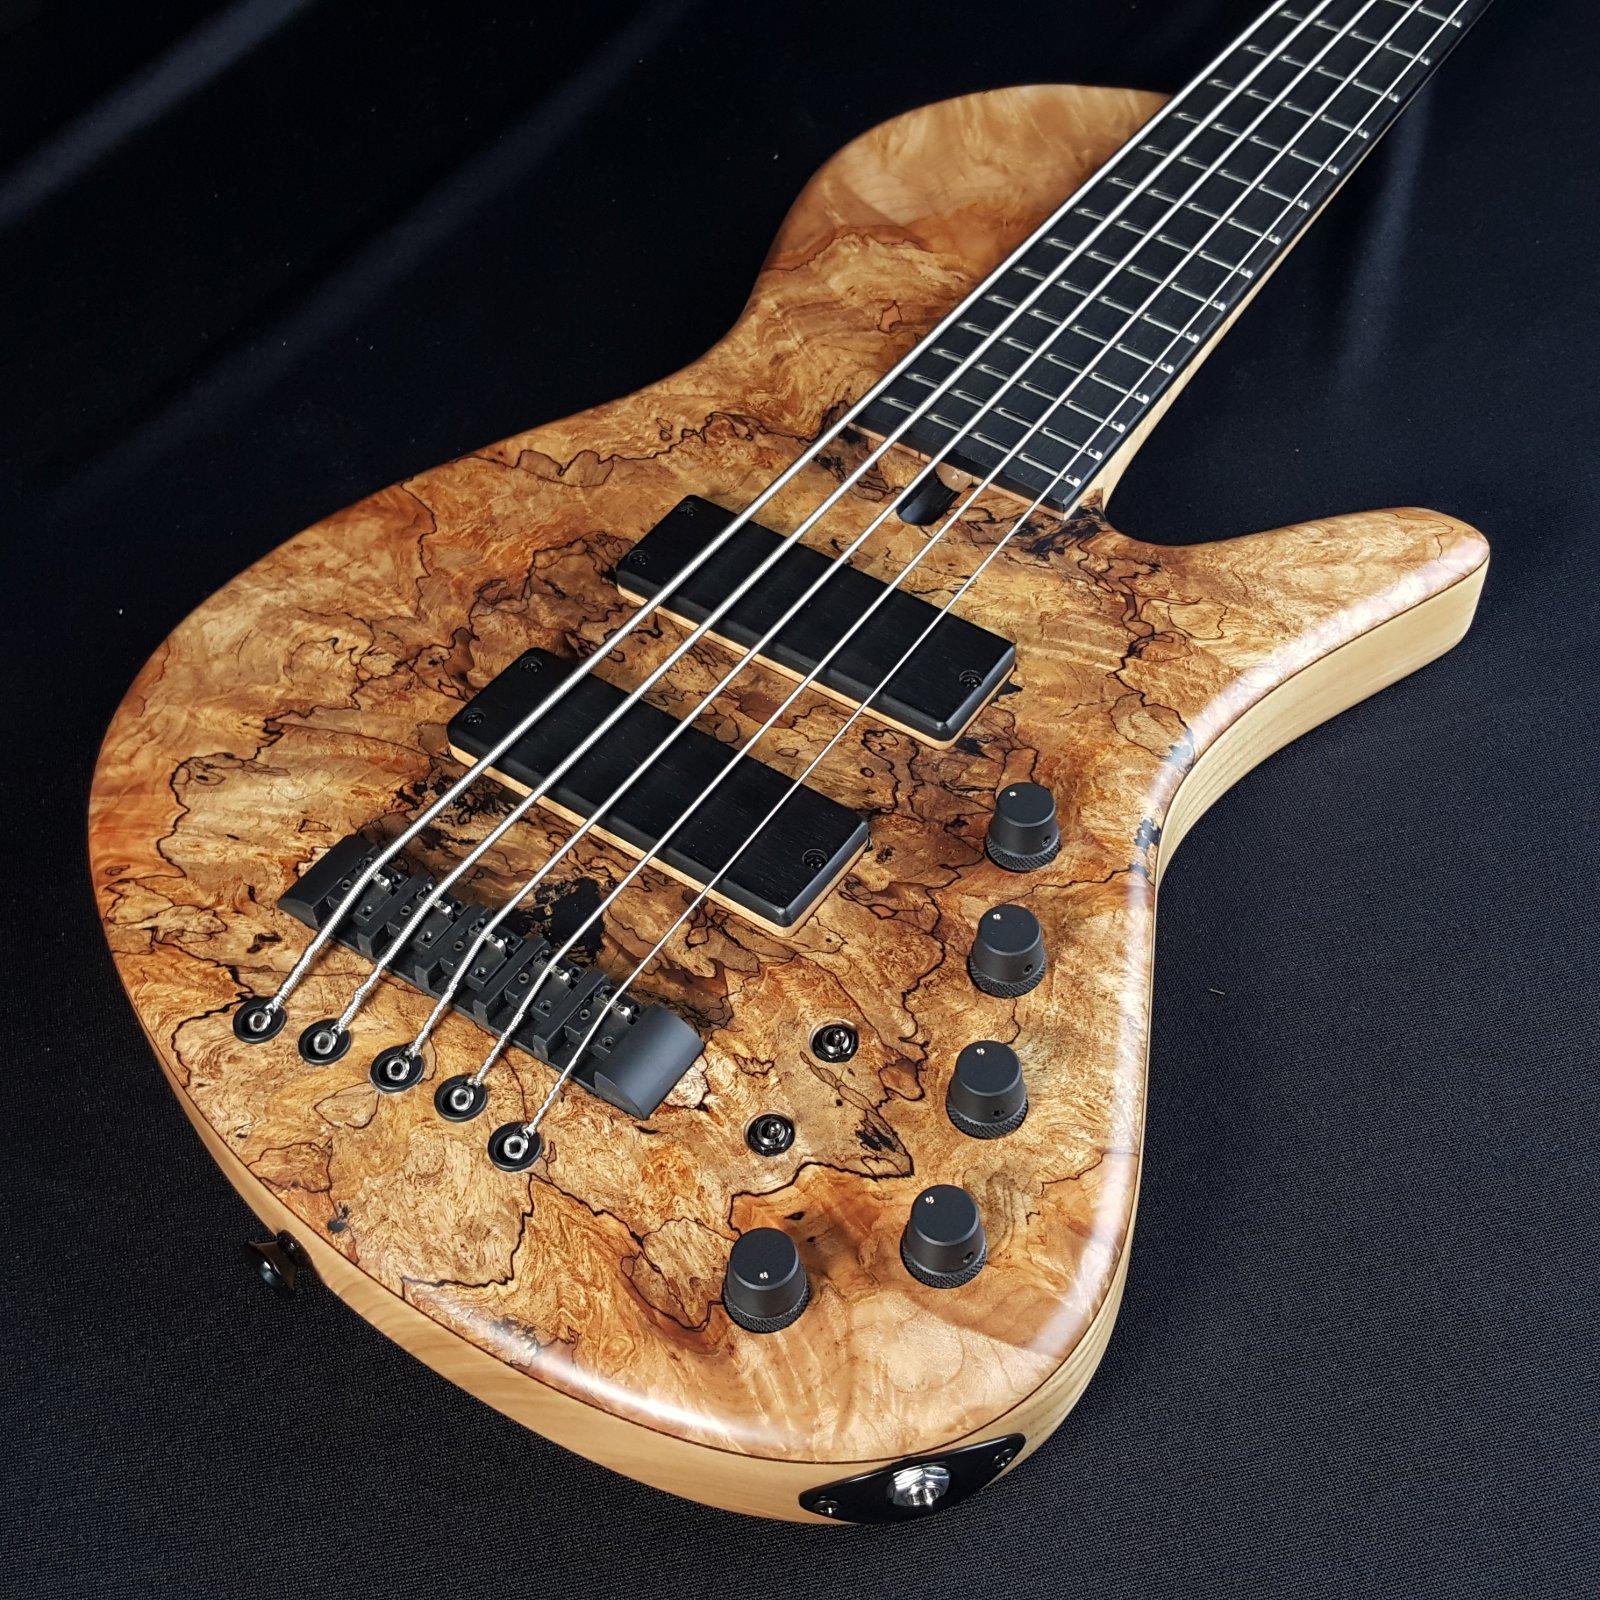 Maruszczyk 5-String Bass Sputnik 5A Single Cut w/ Gig Bag